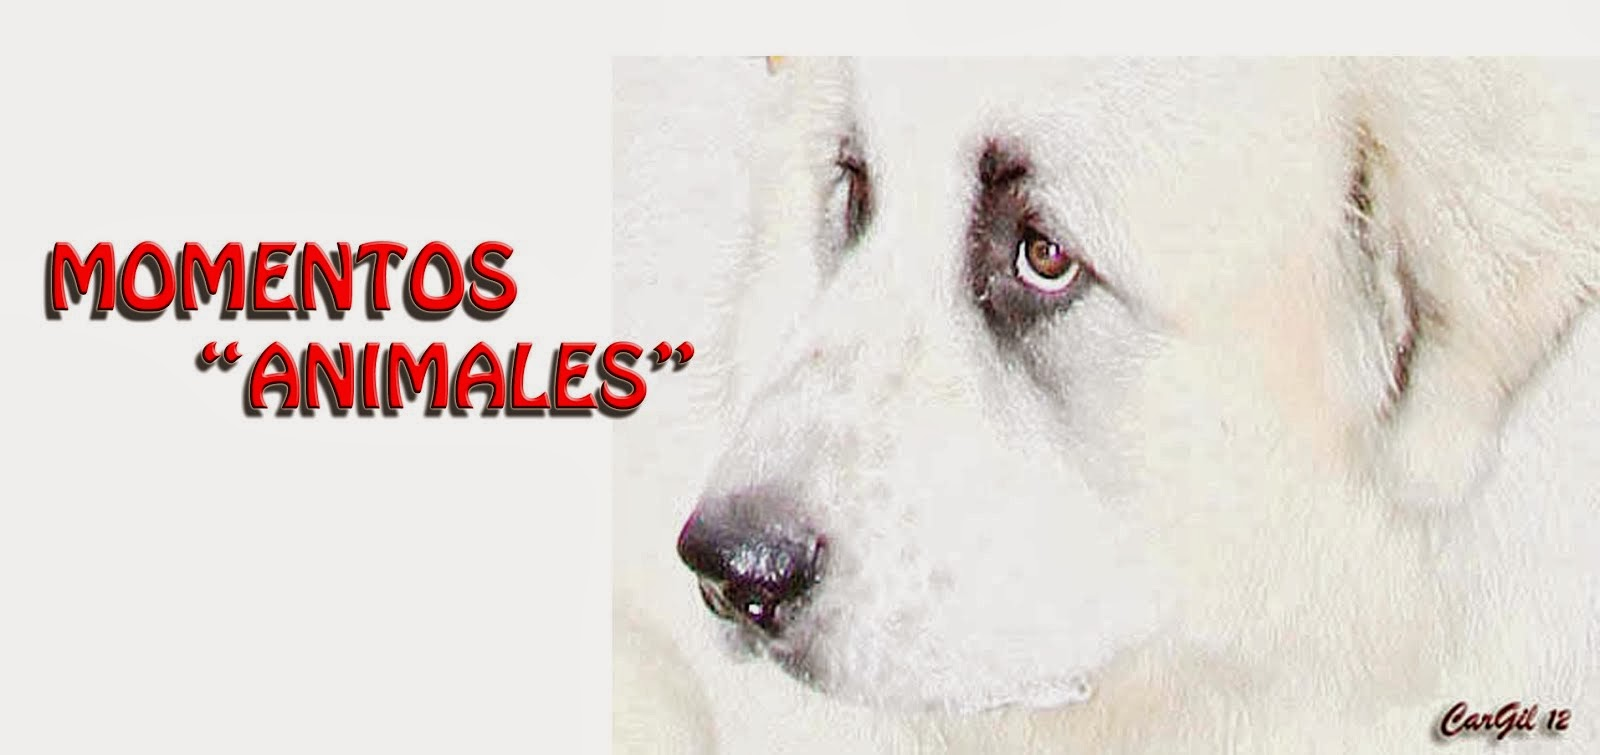 MOMENTOS ANIMALES